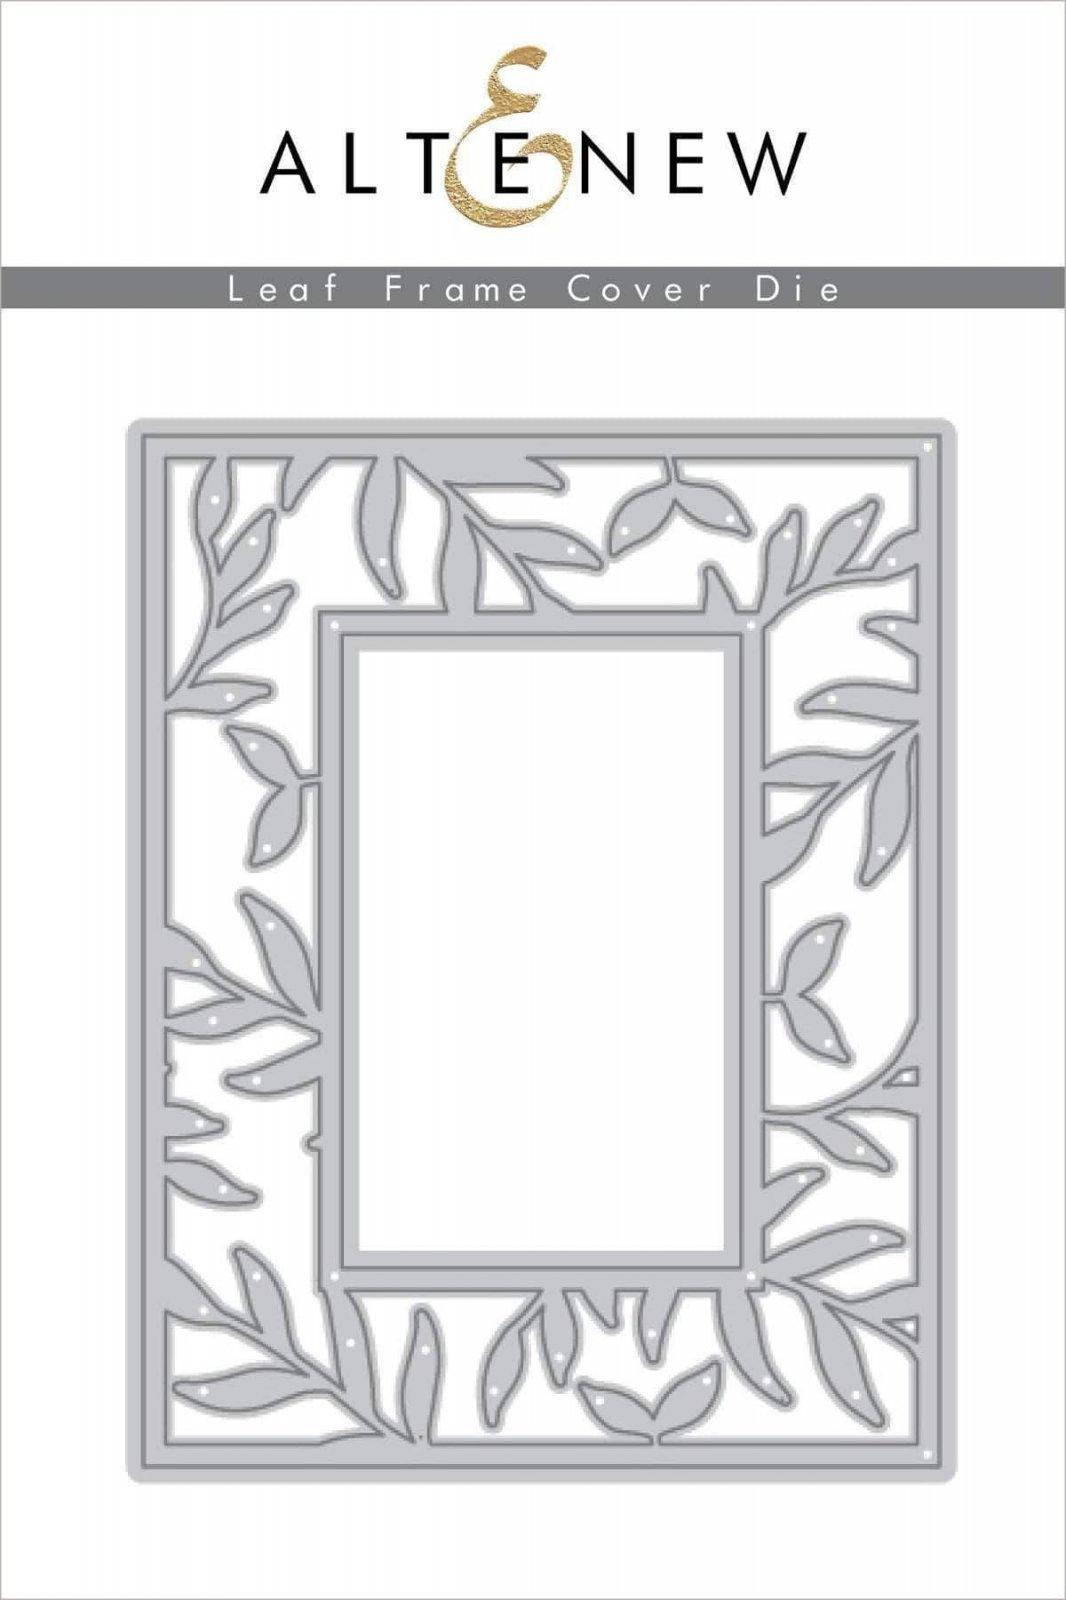 Altenew Leaf Frame Cover Plate Die